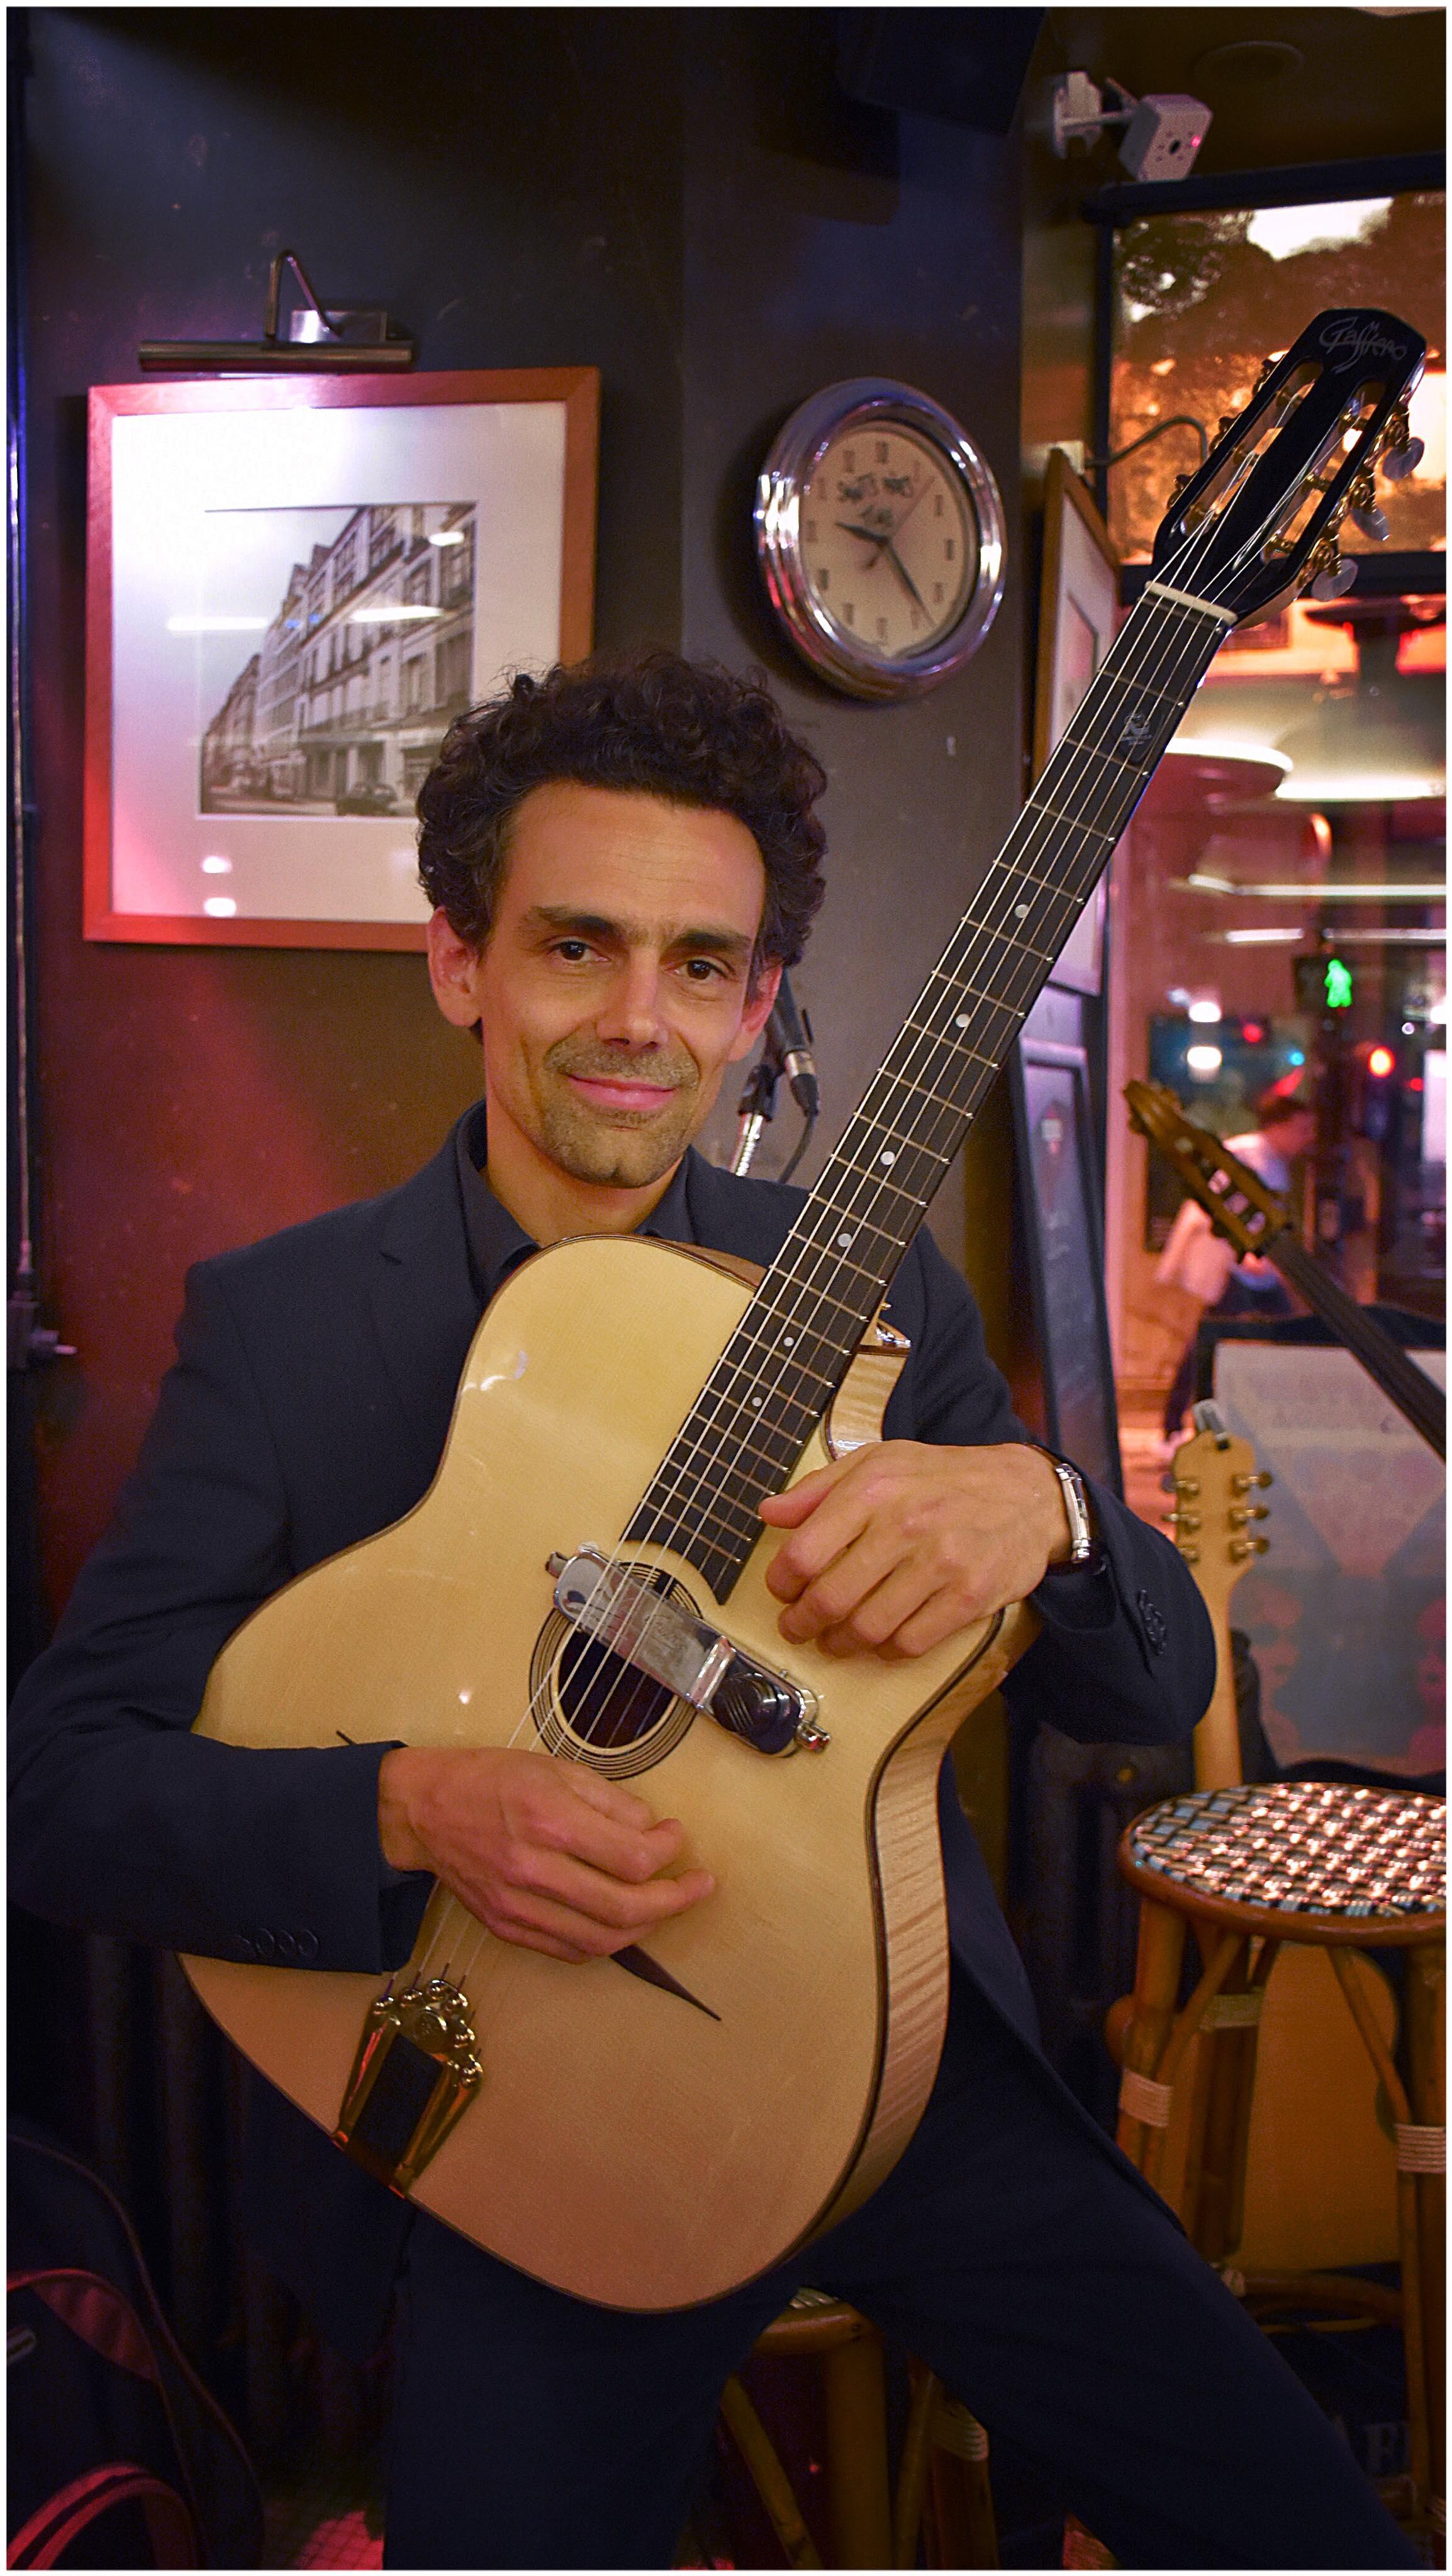 christophe astolfi guitare manouche